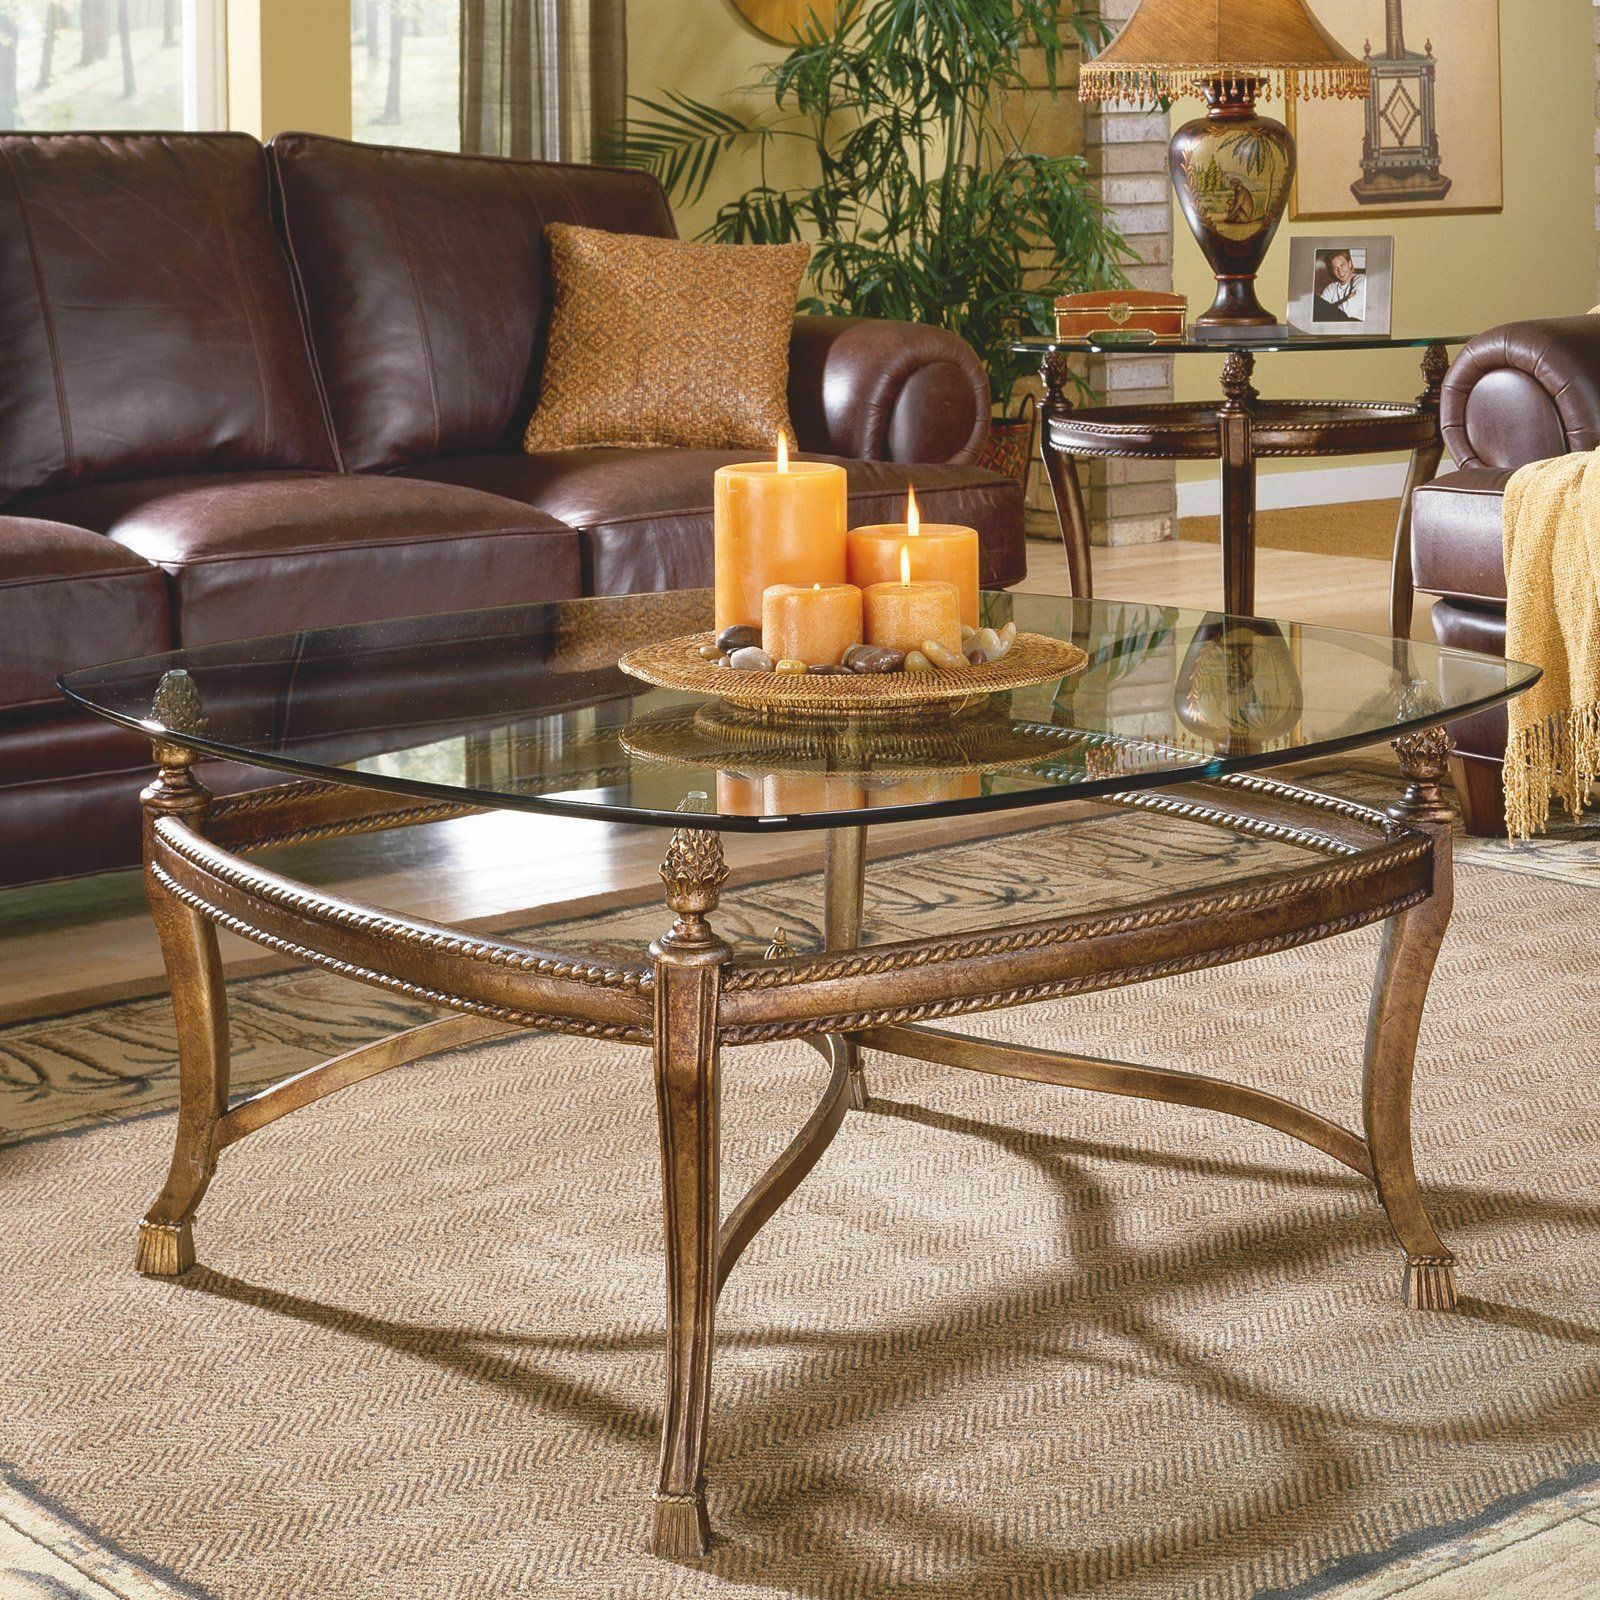 Hammary suffolk bay 2 piece square coffee table set 839 99